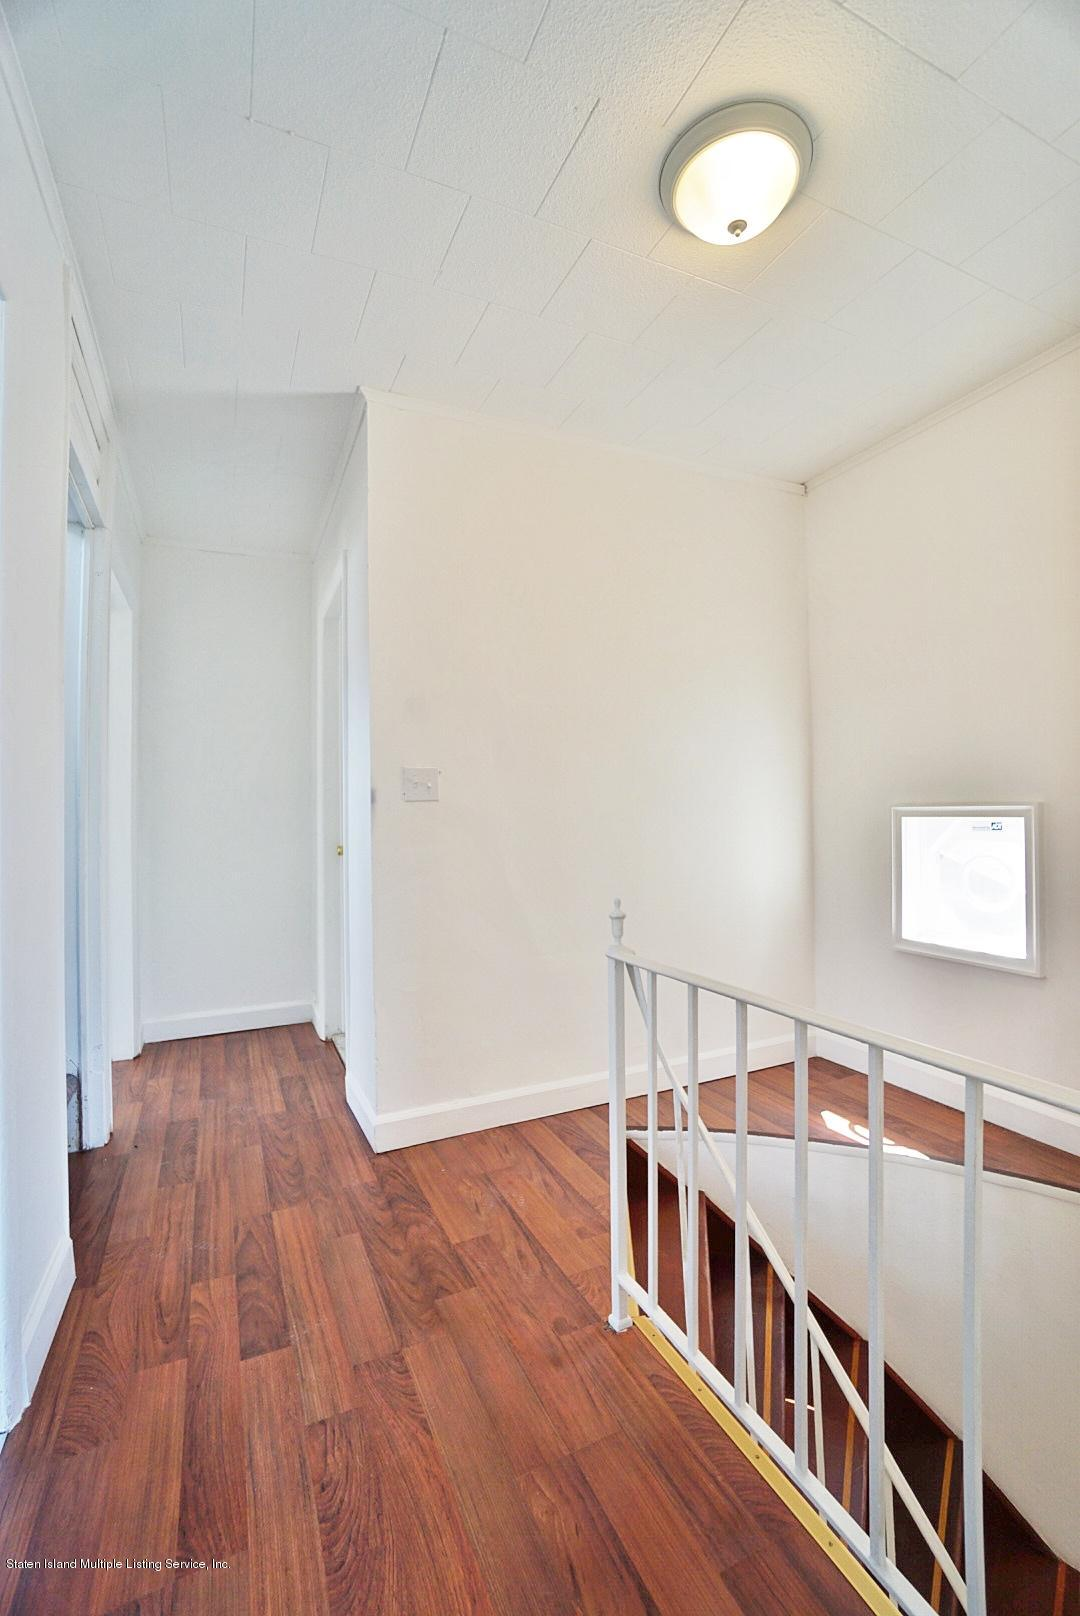 Single Family - Detached 53 Dubois Avenue  Staten Island, NY 10310, MLS-1128749-32